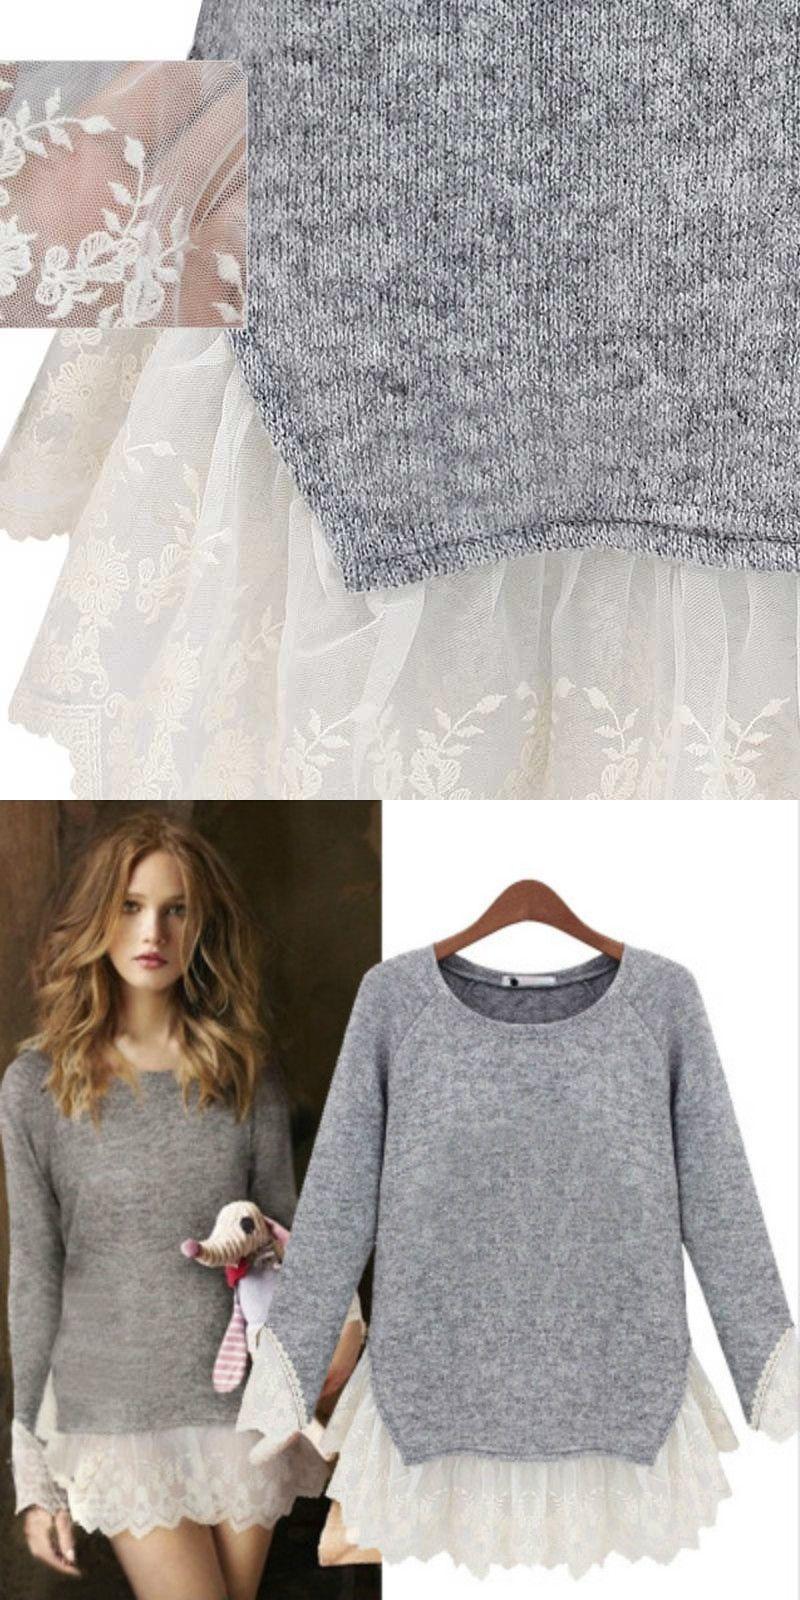 e27789e6c46 Spring autumn Plus-size pregnant women dress Fashion splicing lace maternity  clothes knit Dresses For